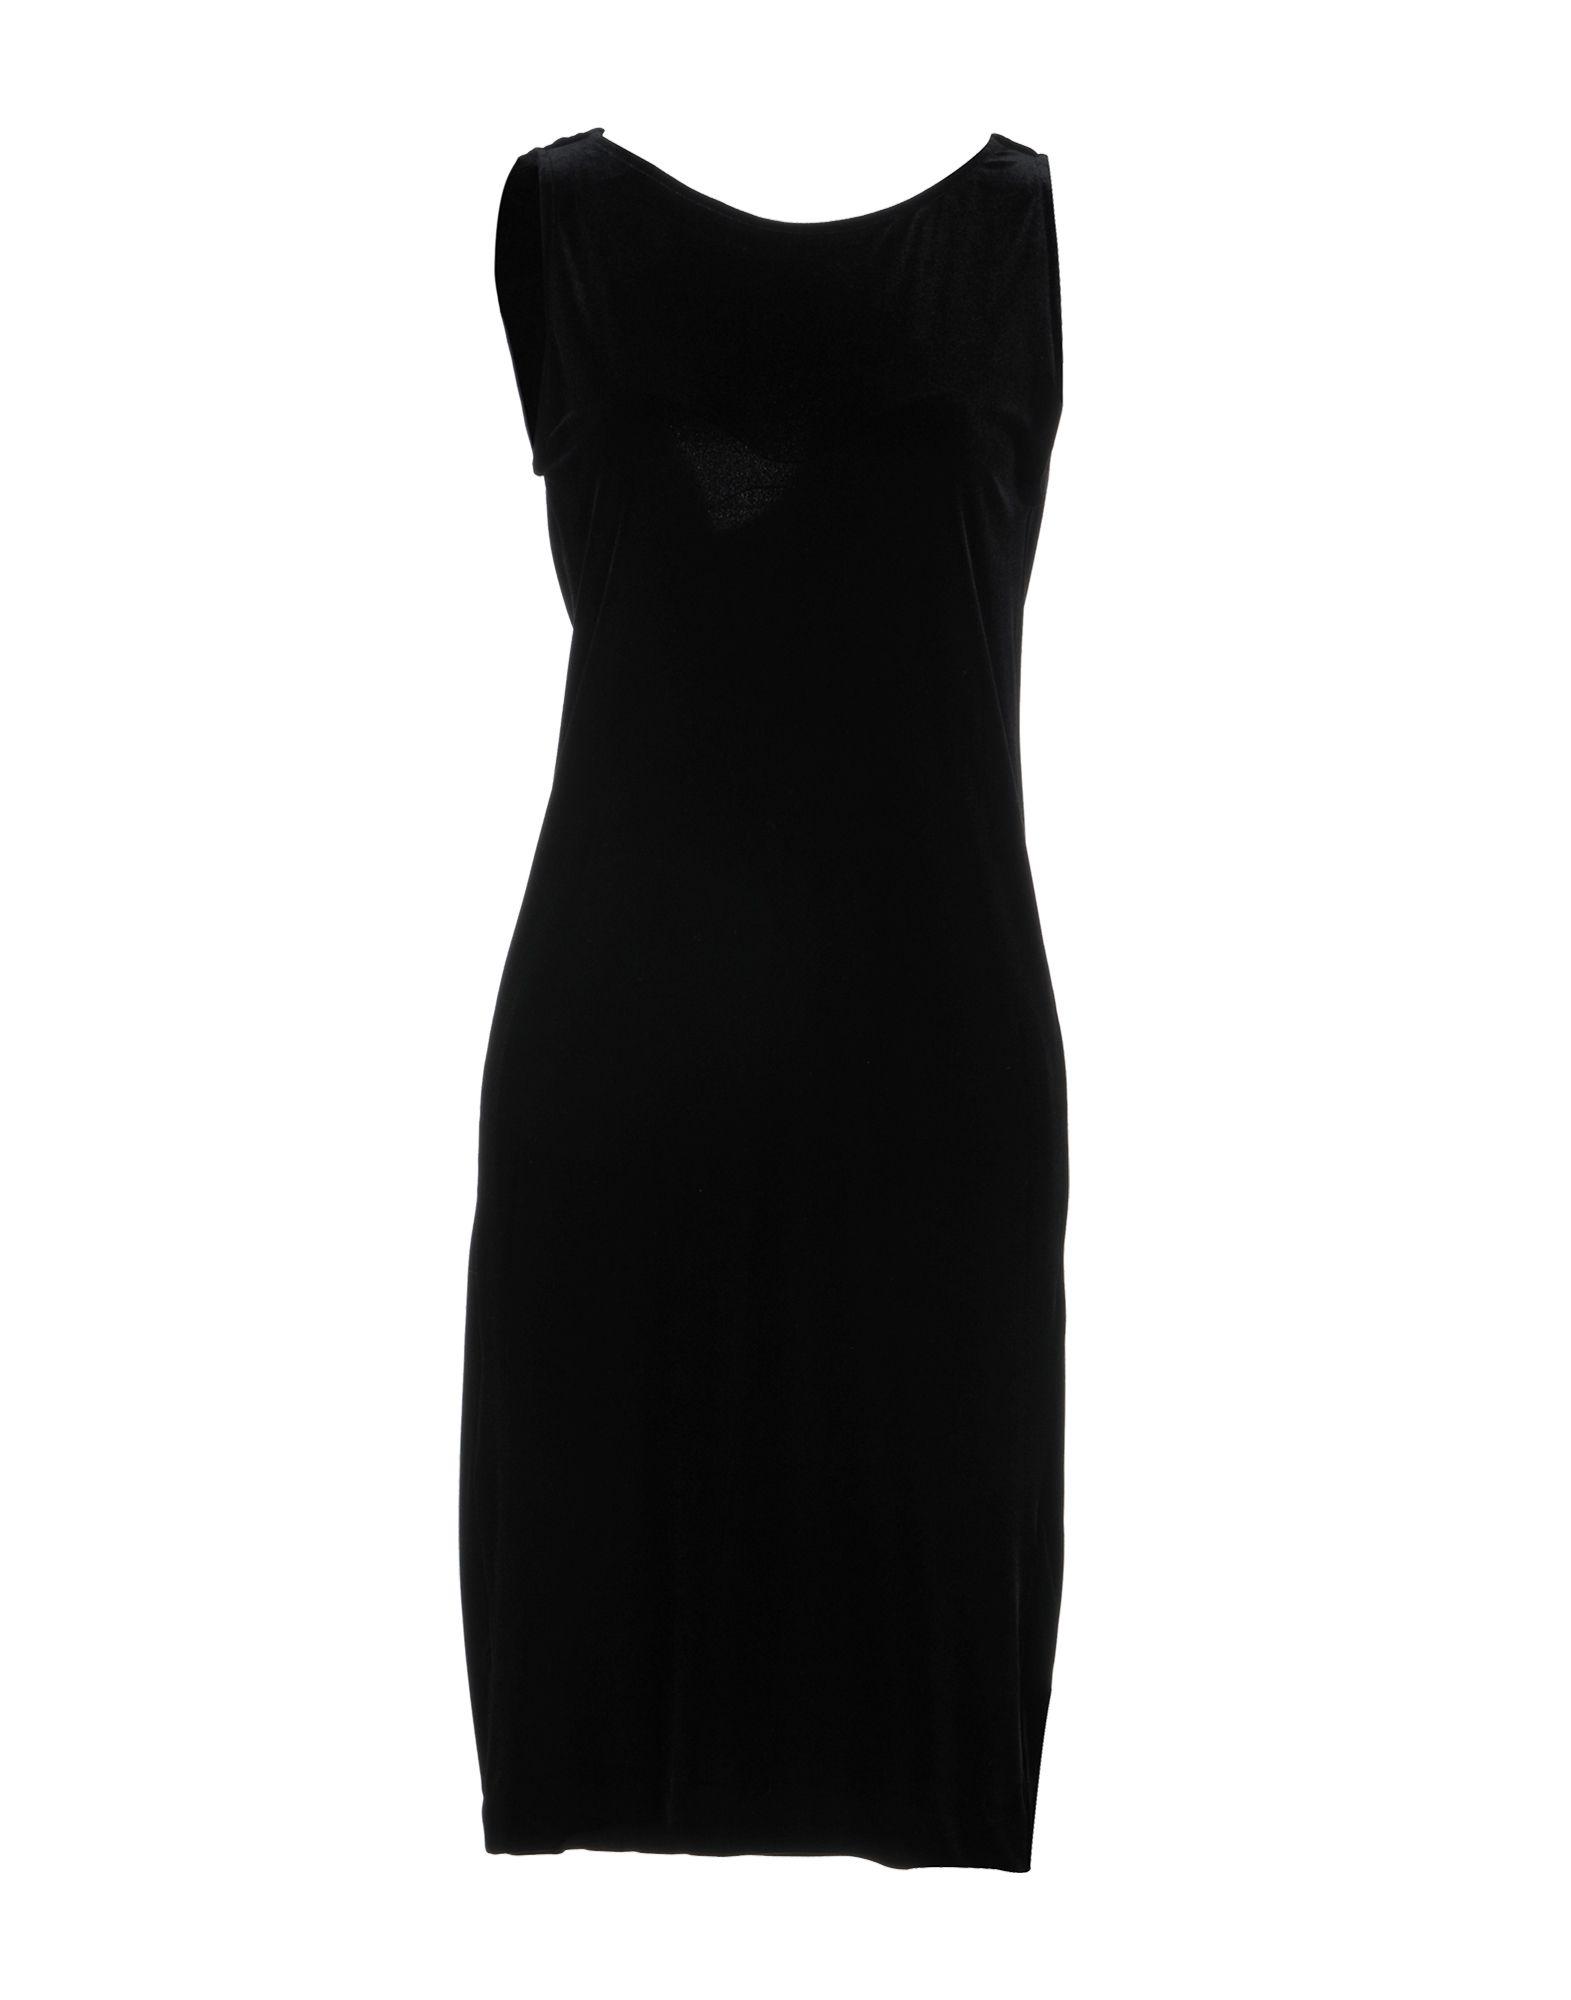 LE COL Knee-Length Dress in Black